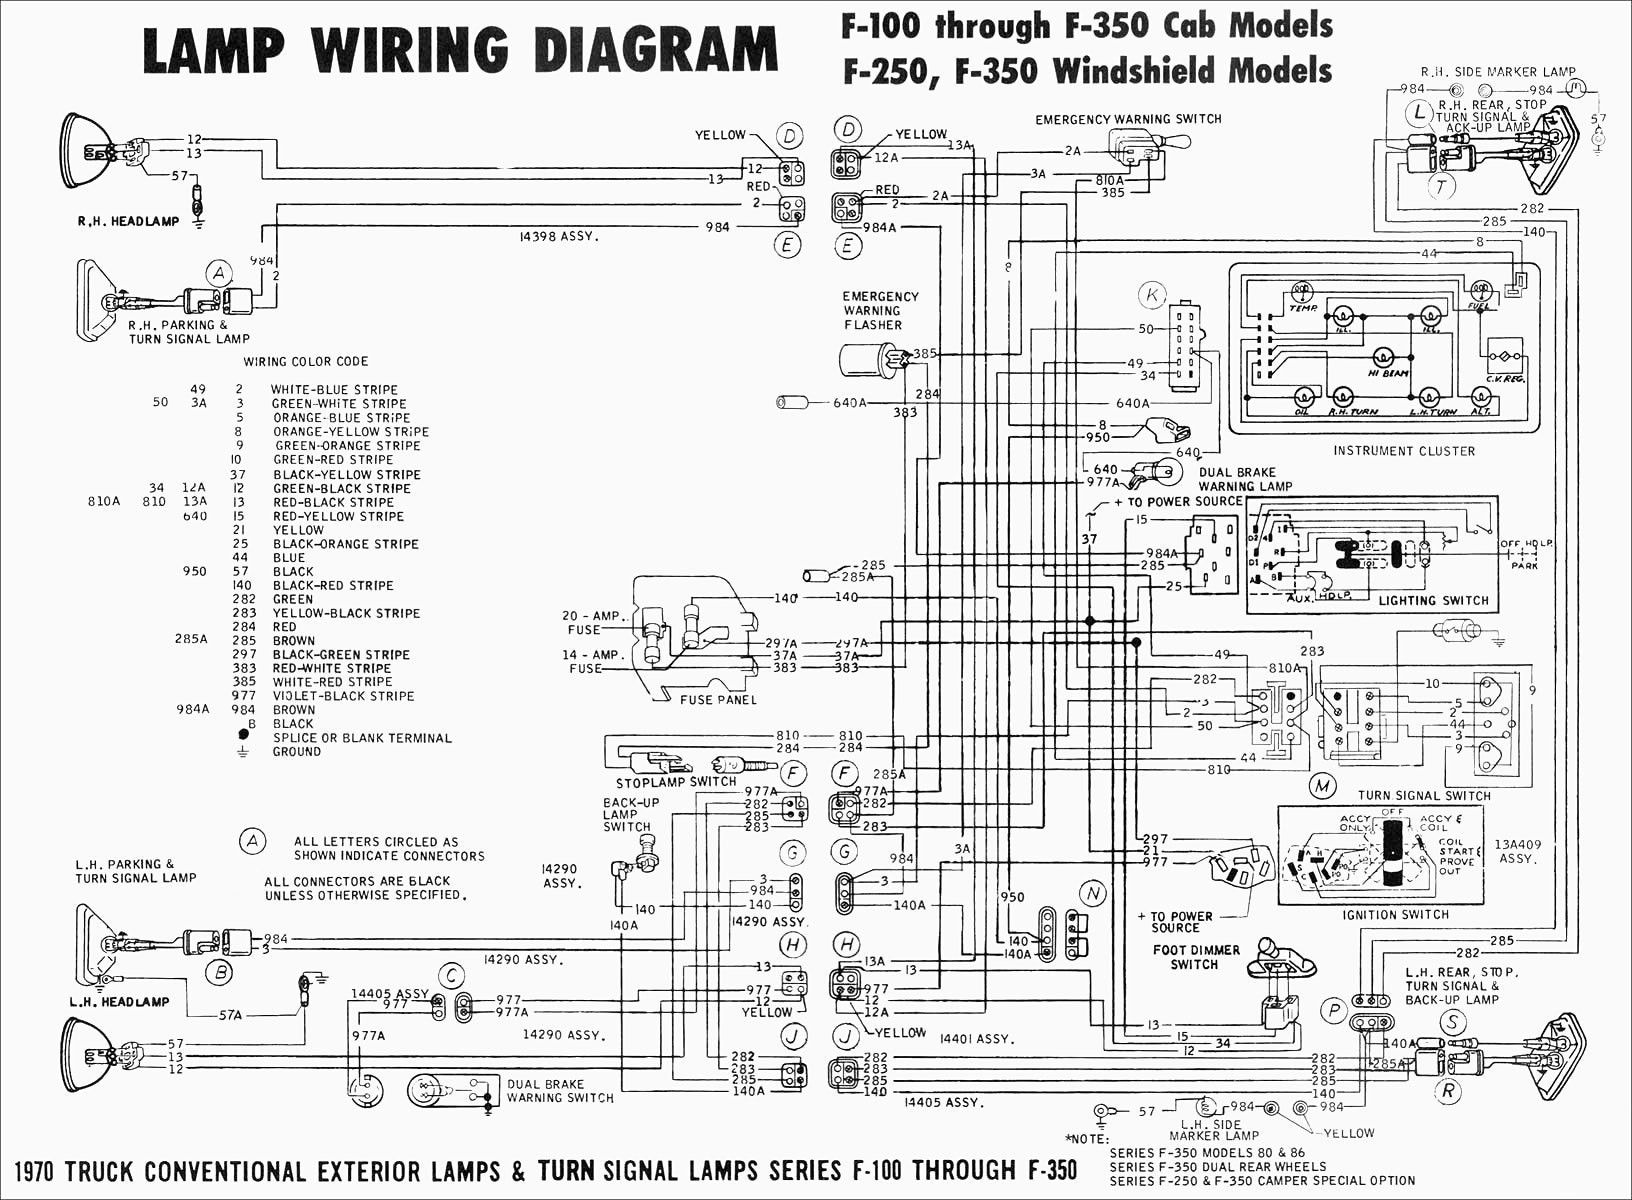 New Wiring Diagram Key Diagram Wiringdiagram